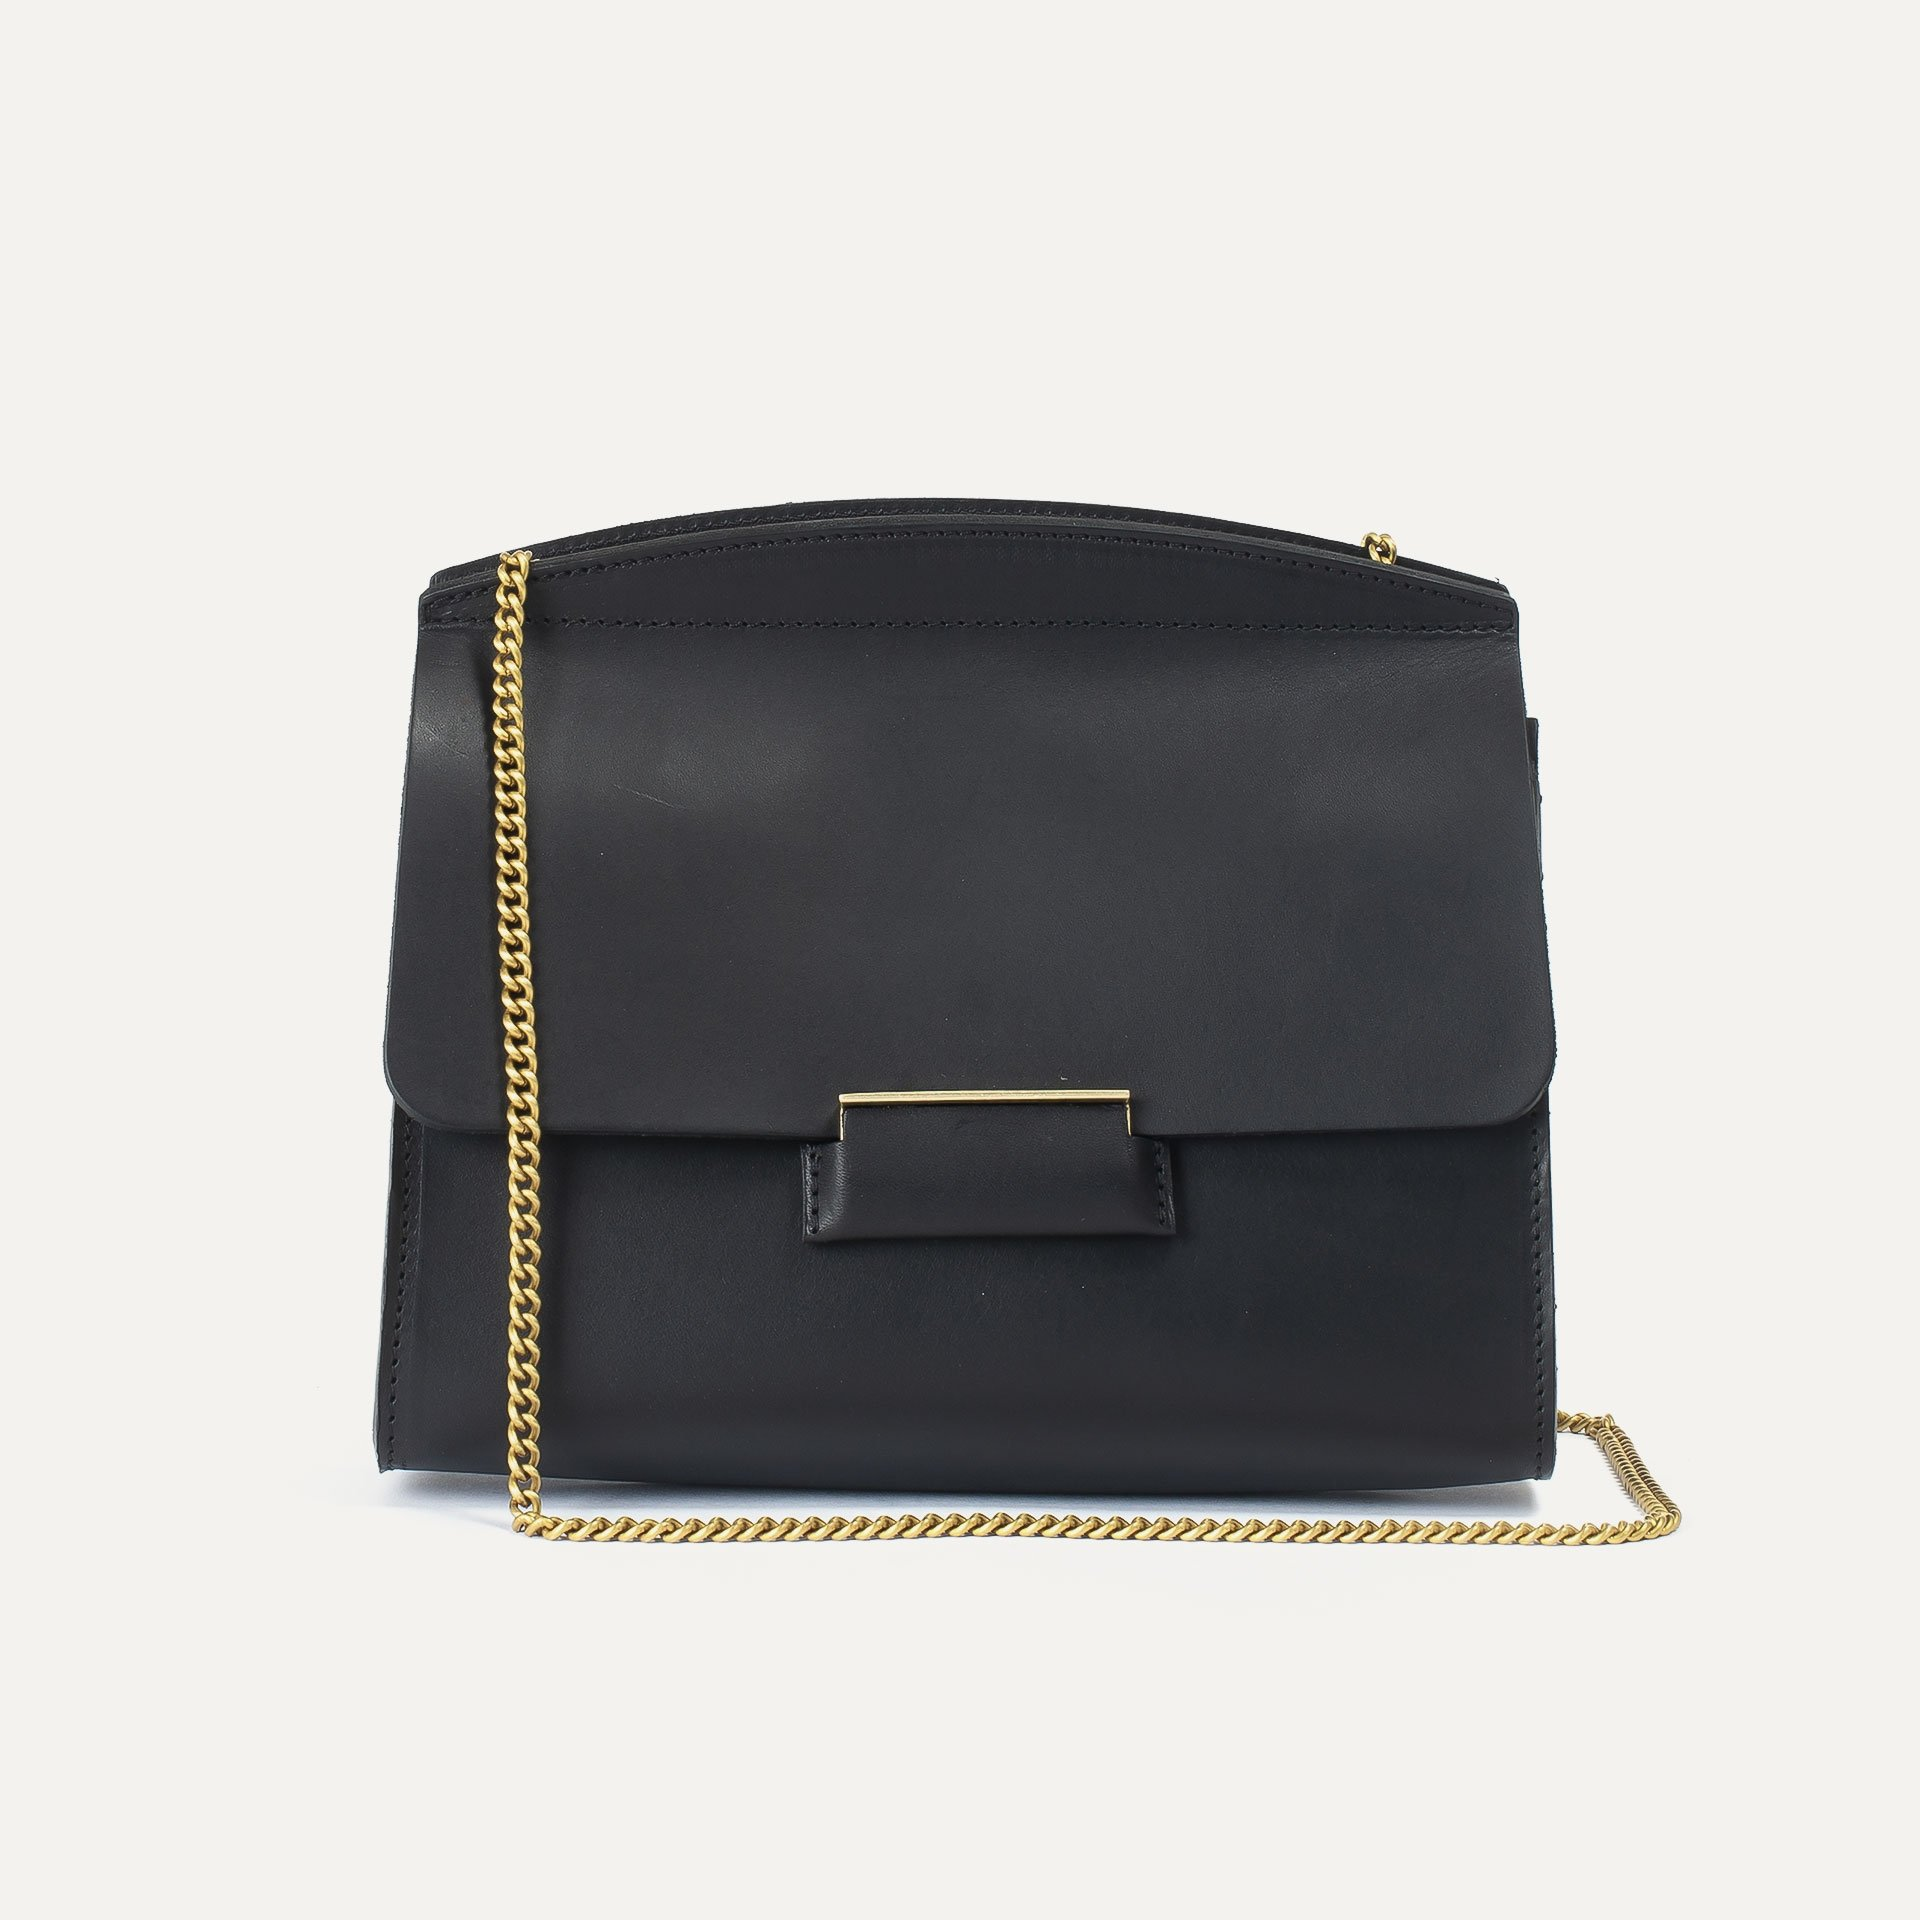 Origami S clutch bag - Black (image n°2)